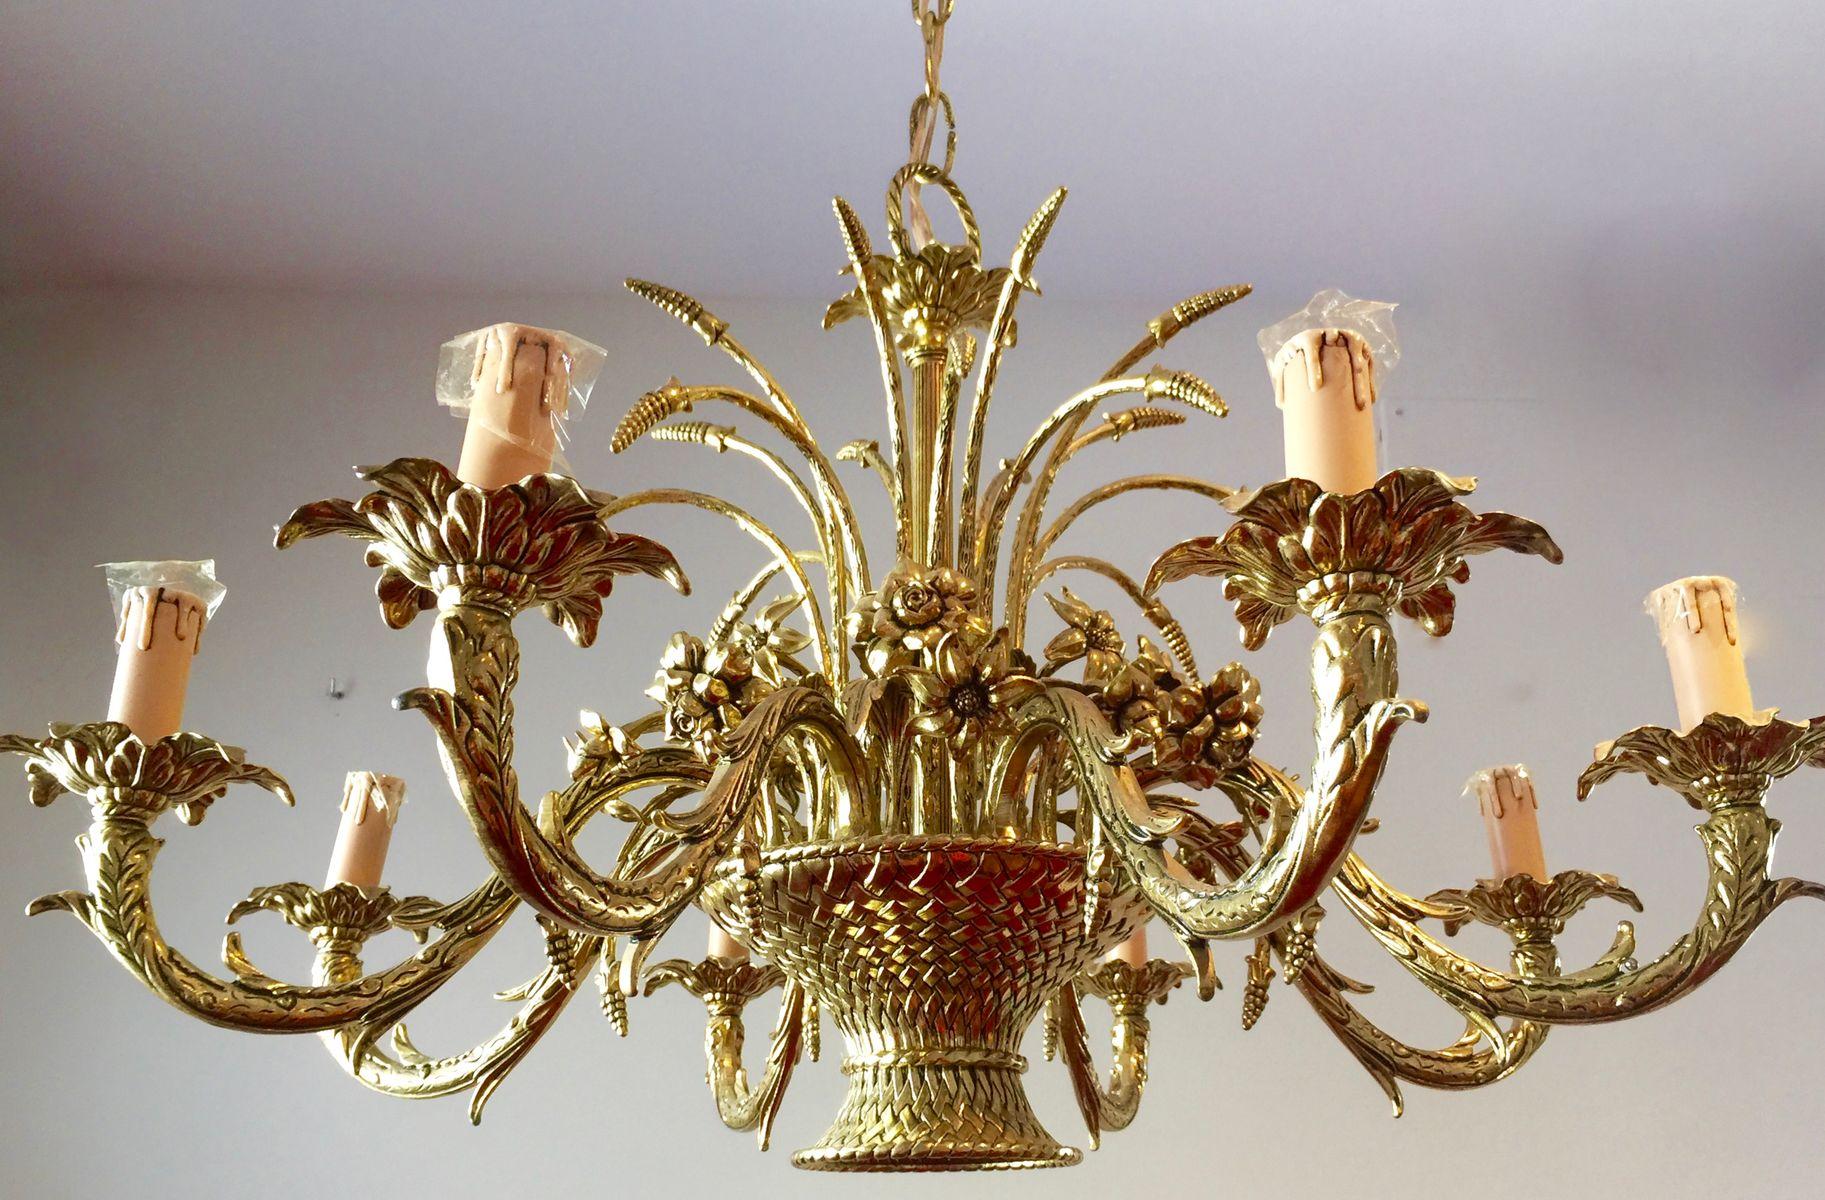 franzsische vergoldeter bronze kronleuchter 1960er - Bronze Kronleuchter